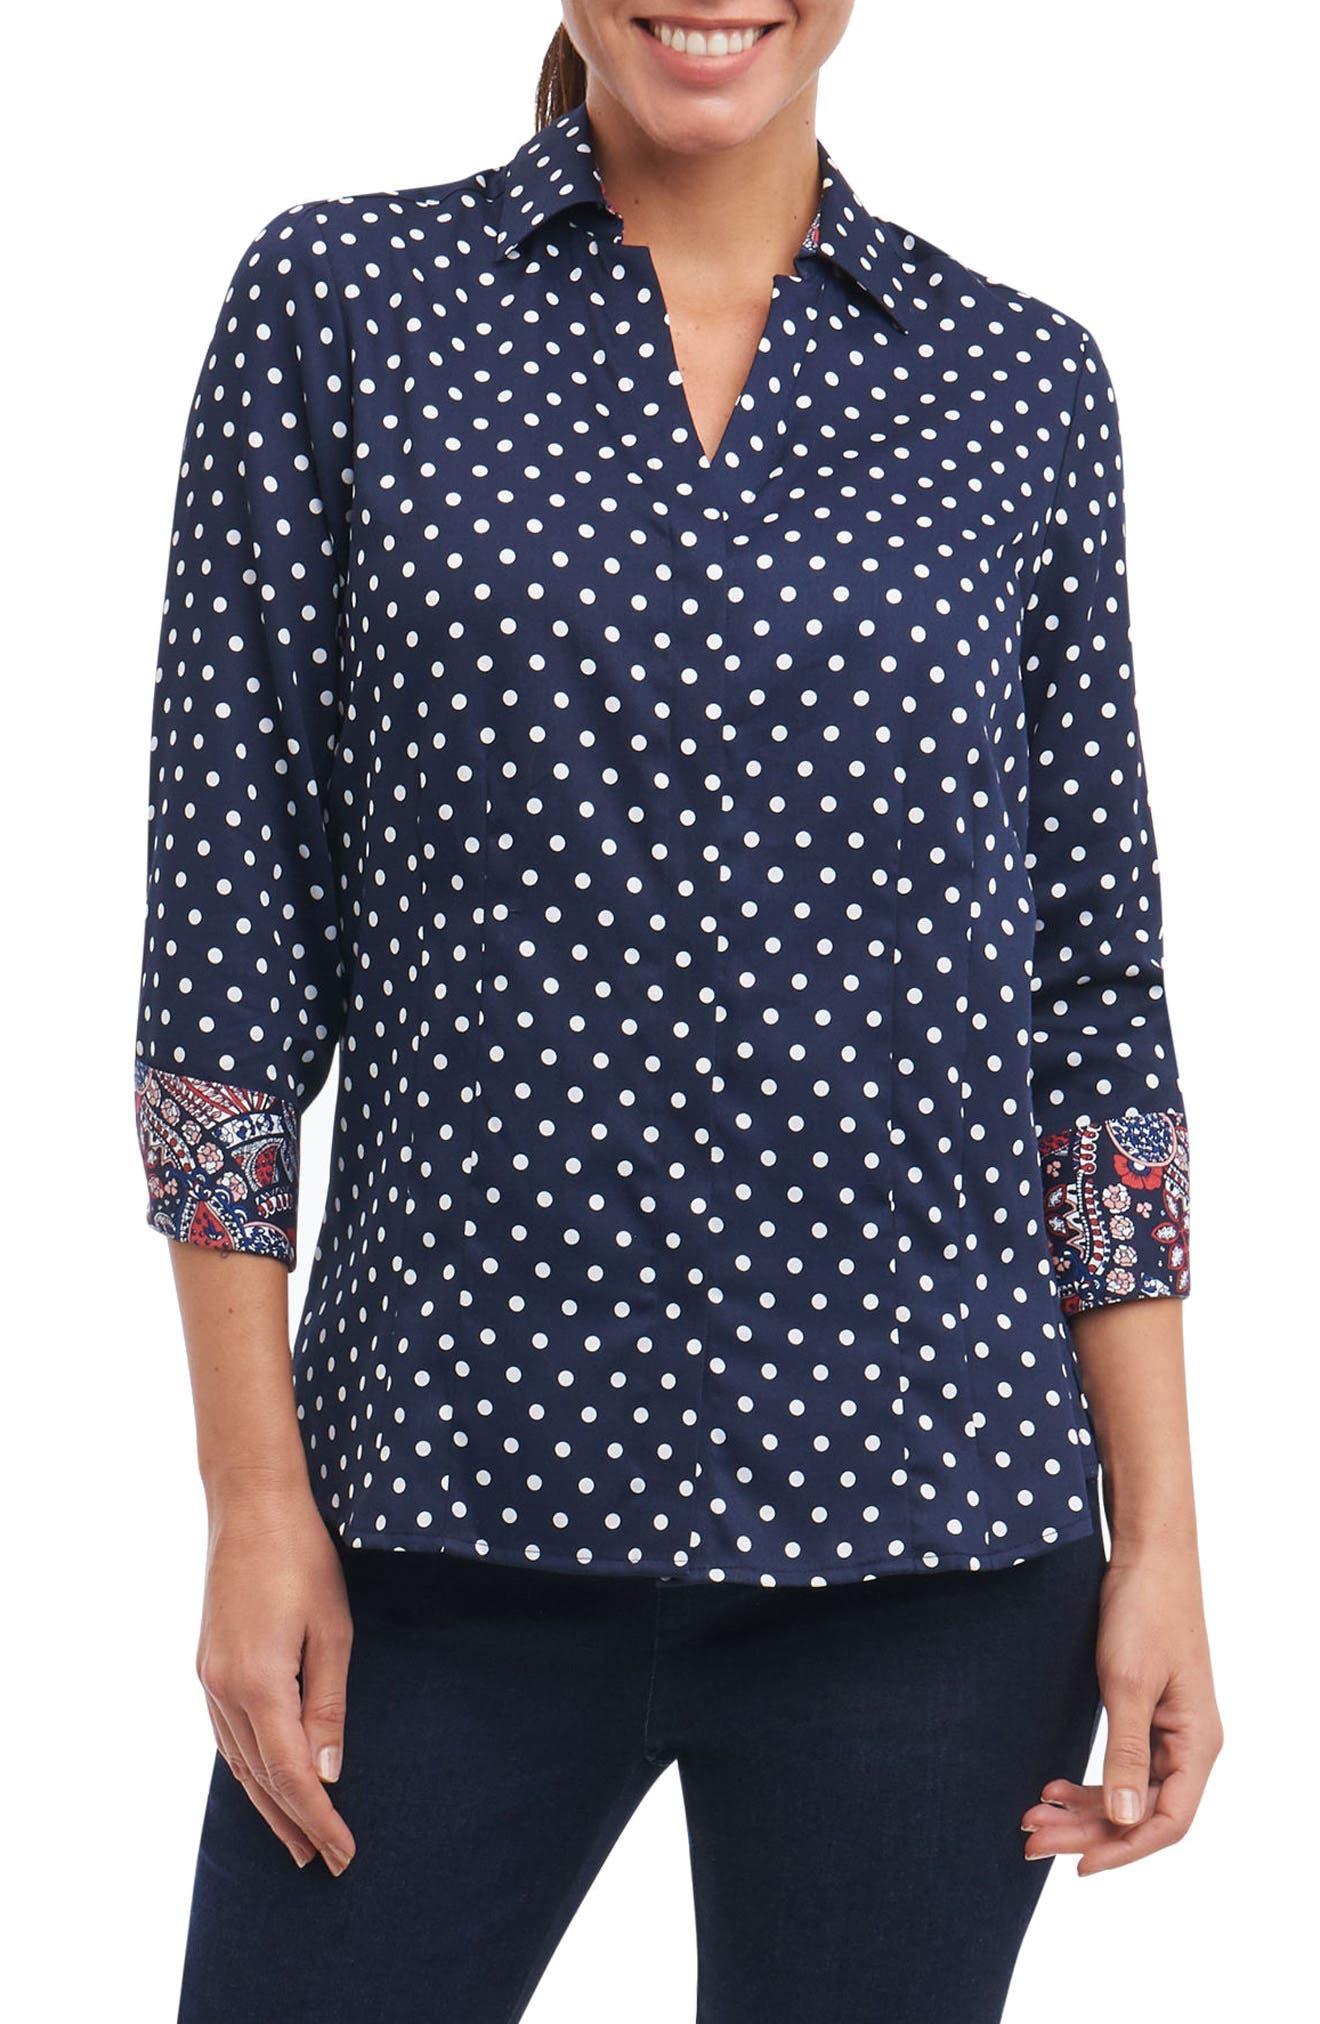 Main Image - Foxcroft Taylor Classic Dot Non-Iron Cotton Shirt (Regular & Petite)